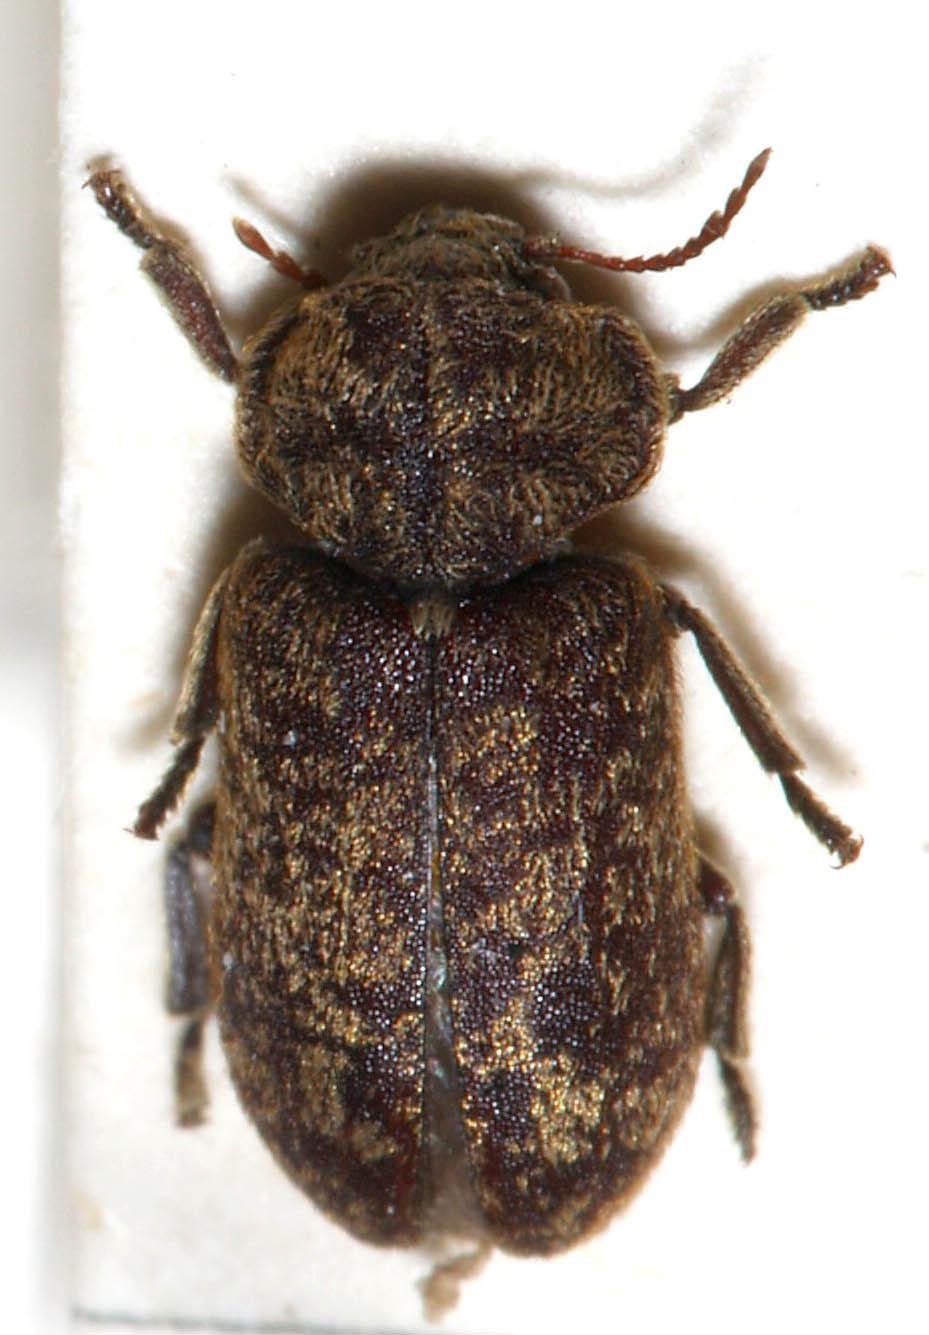 Death Watch Beetle - Xestobium rufovillosum